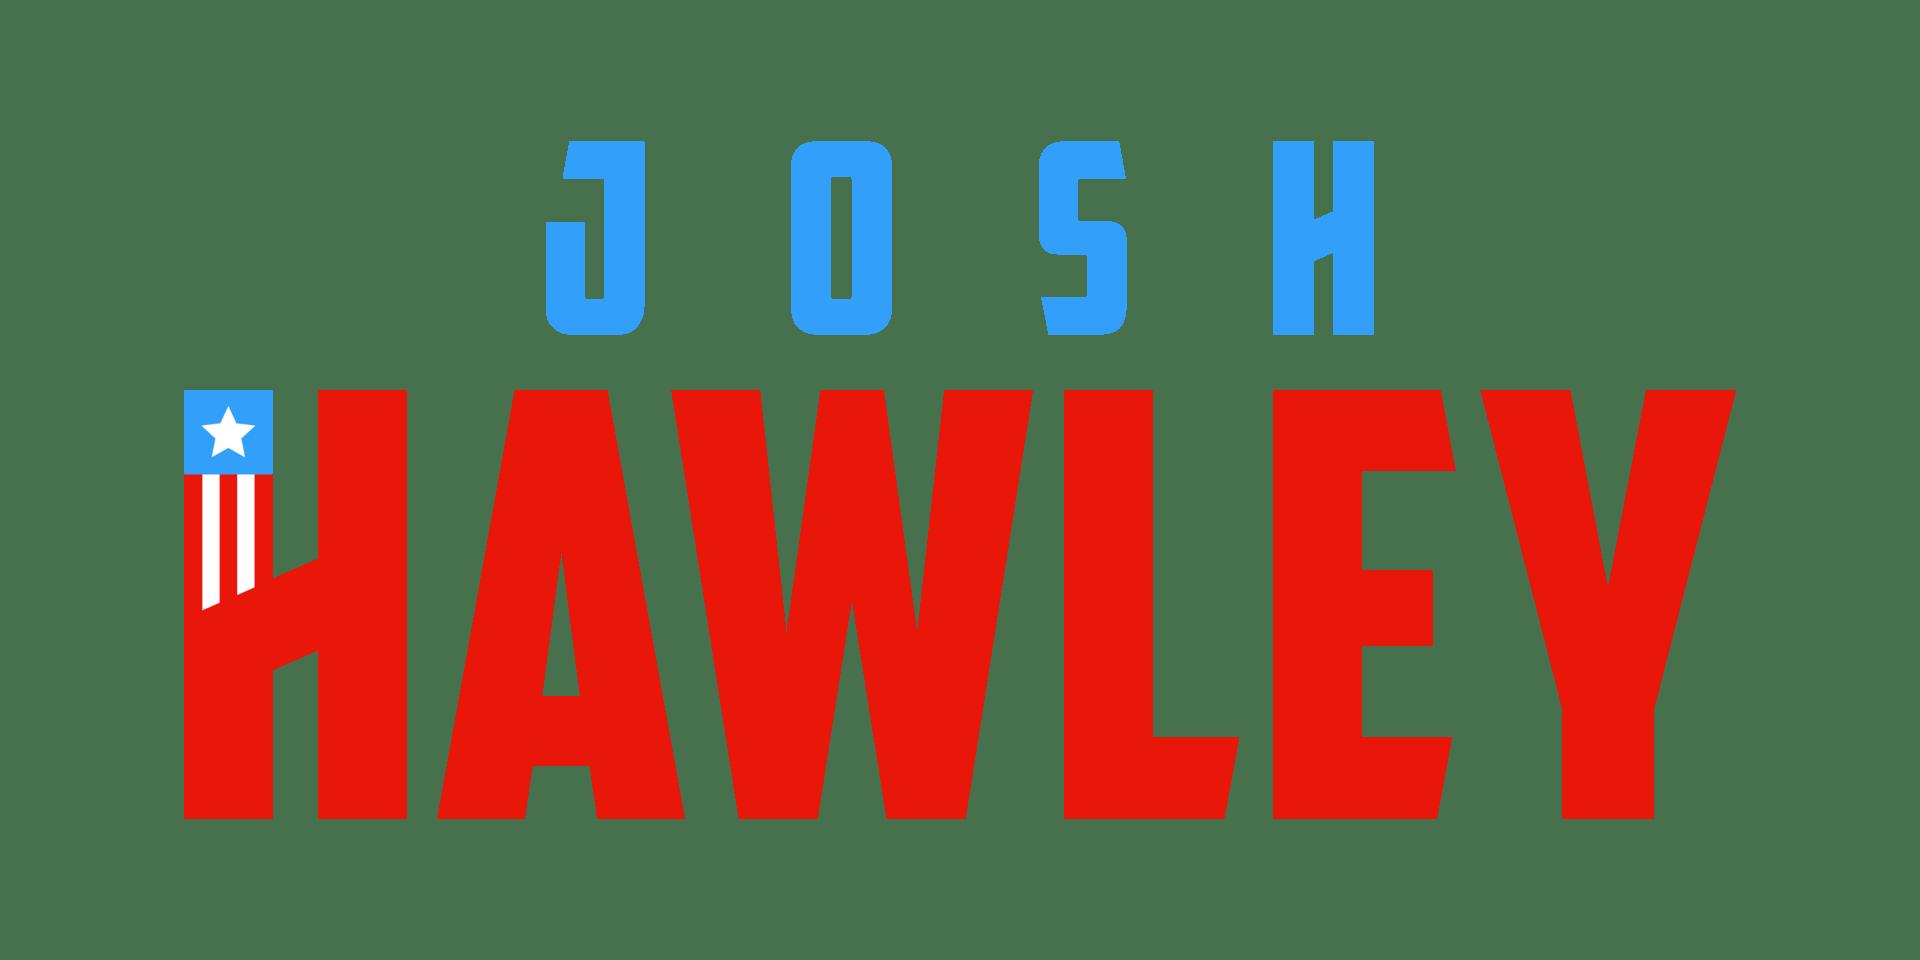 Joshhawley officiallogo  color bluestar